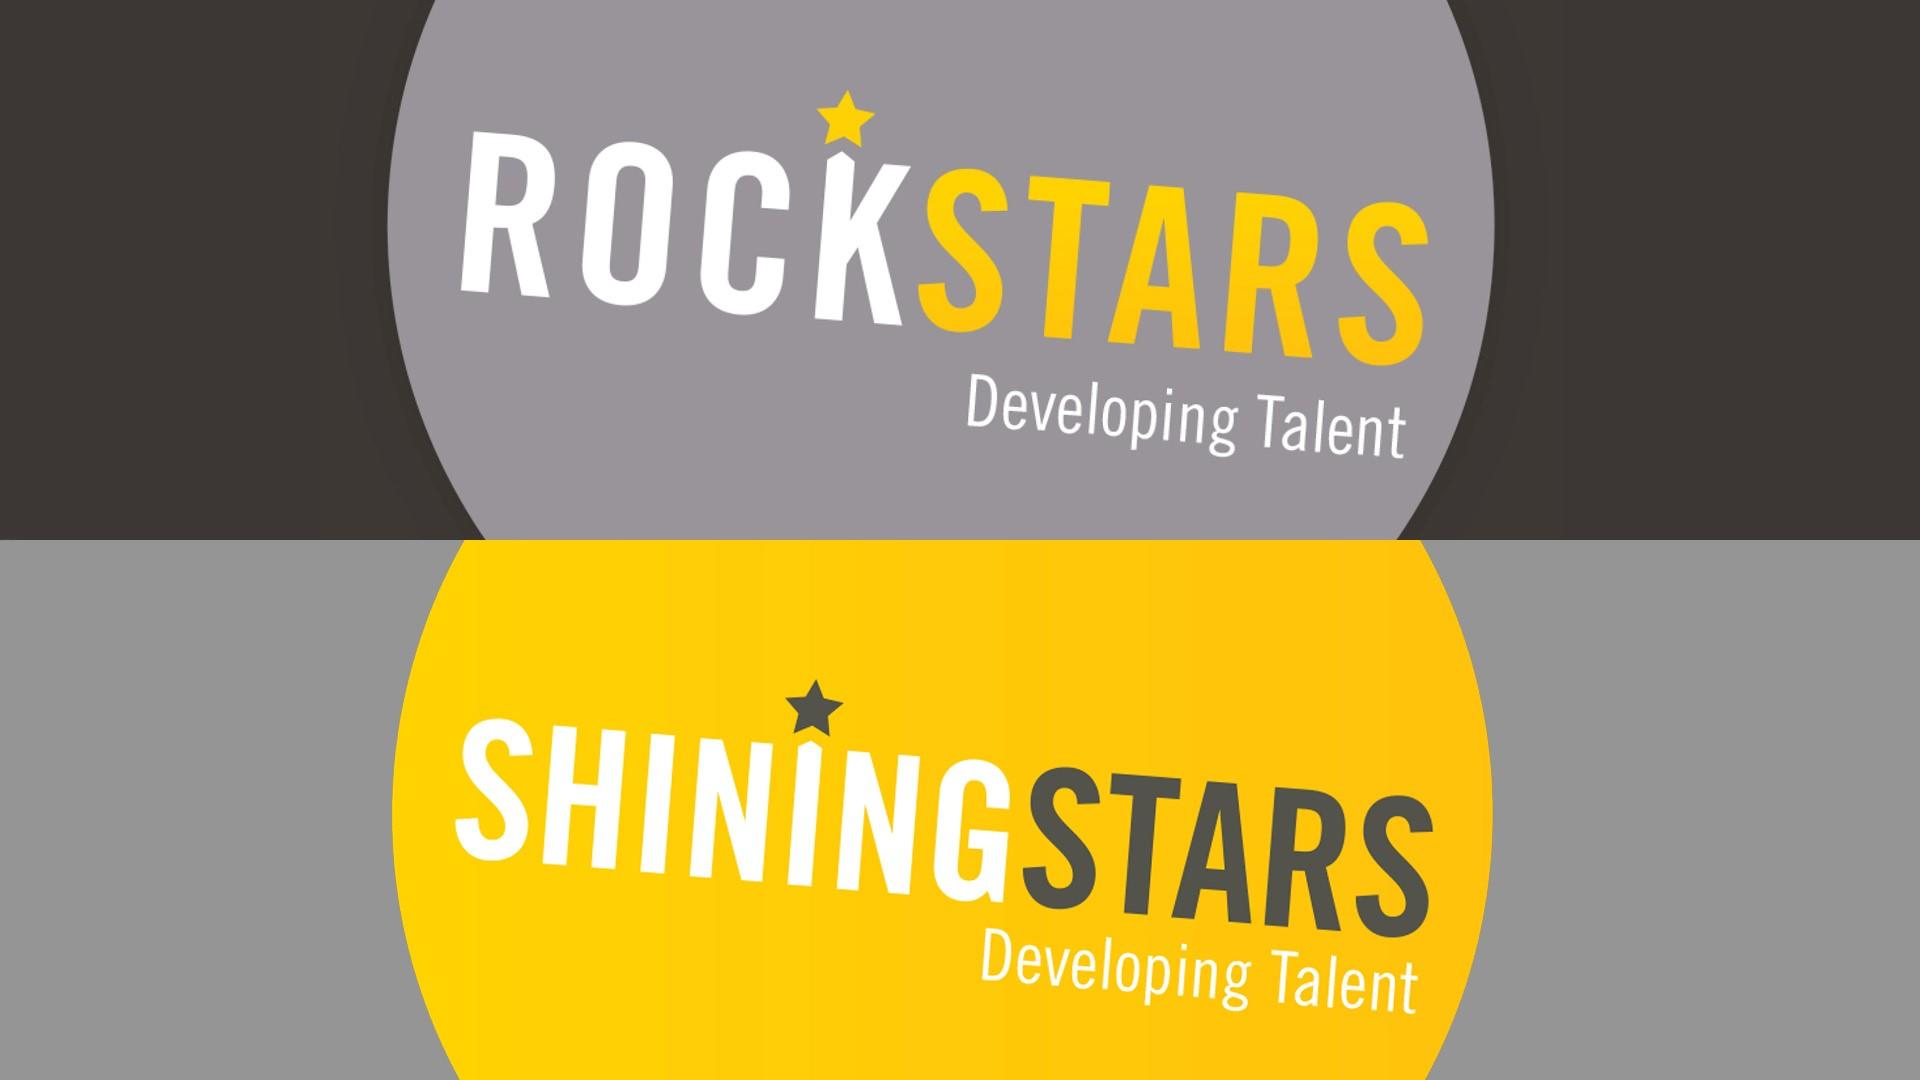 Shining Stars and Rockstars